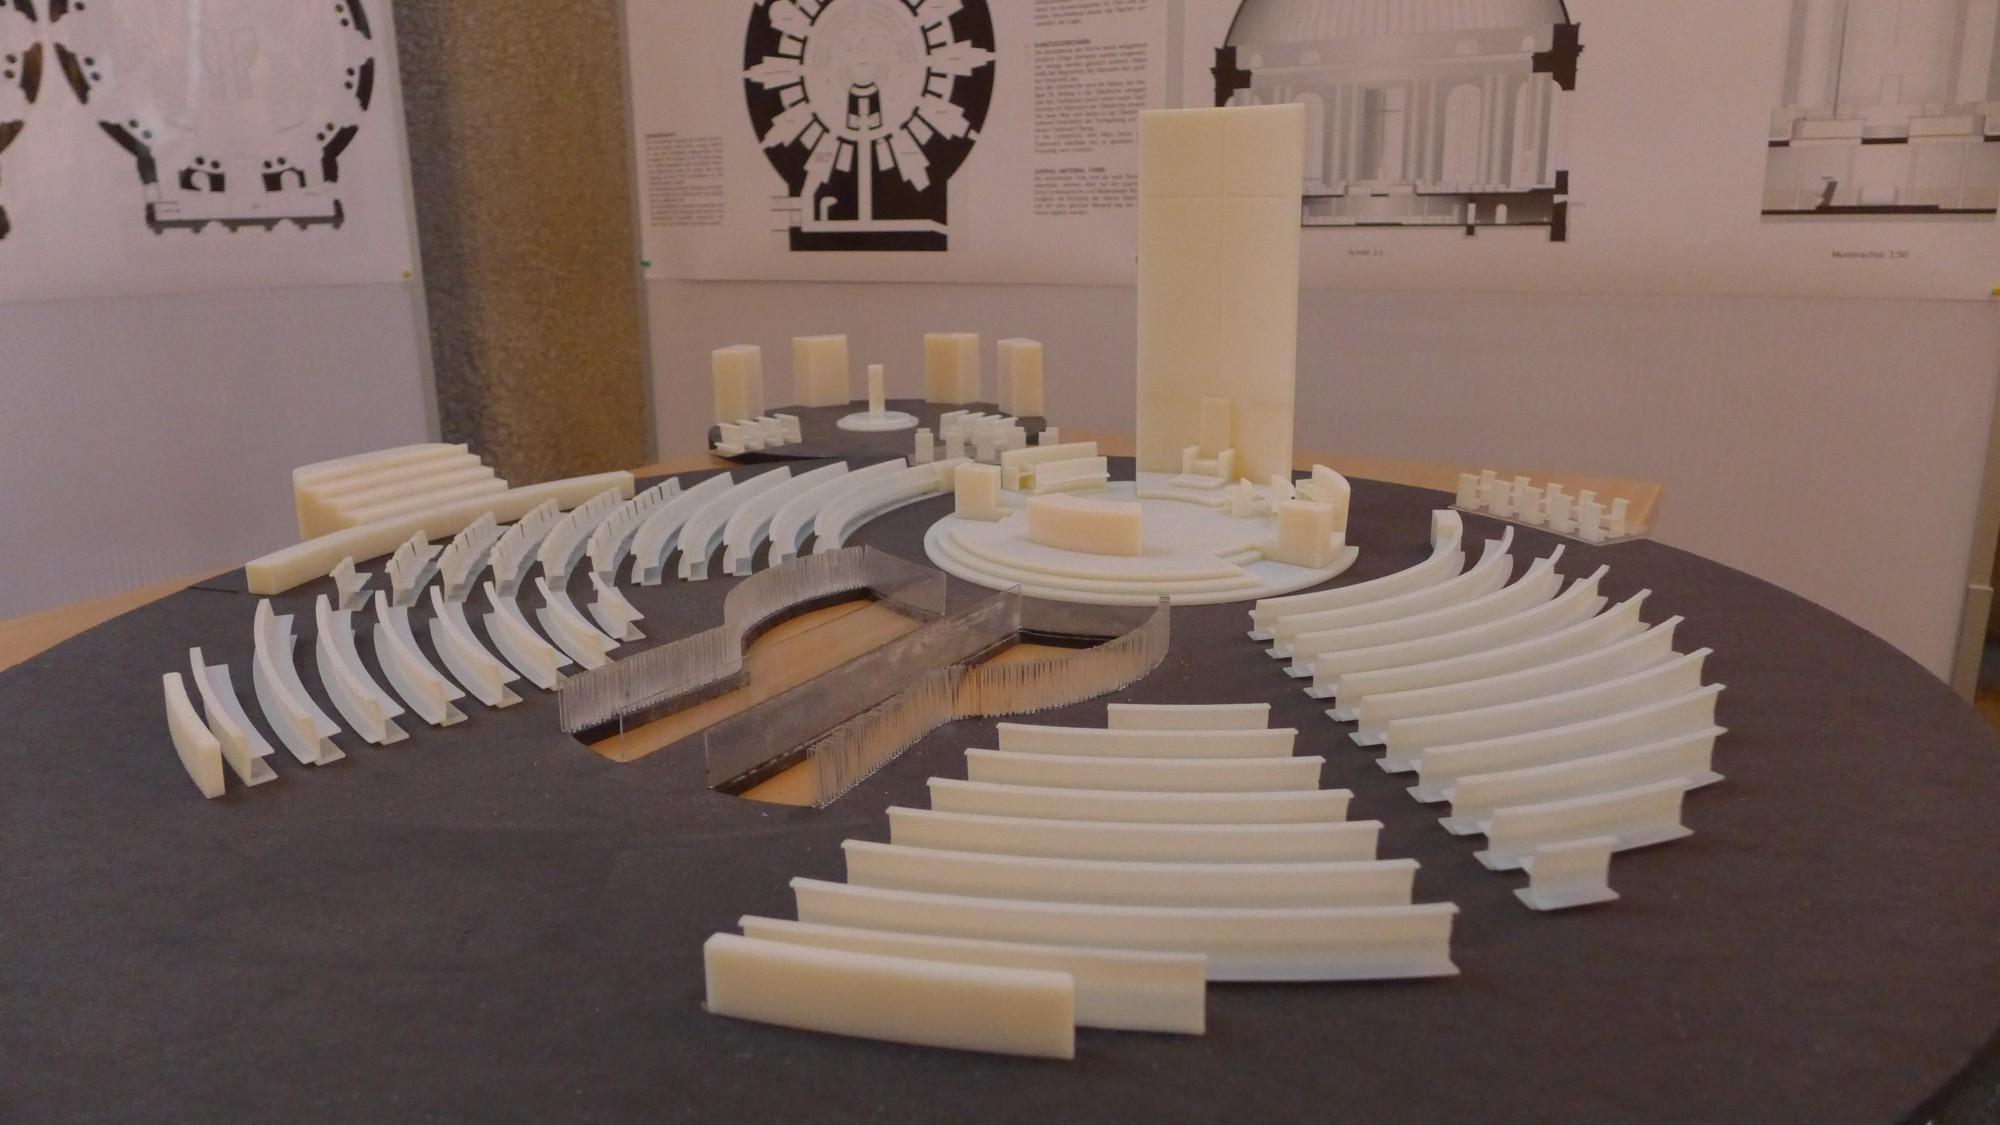 architekturmodell 3d druck service berlin. Black Bedroom Furniture Sets. Home Design Ideas